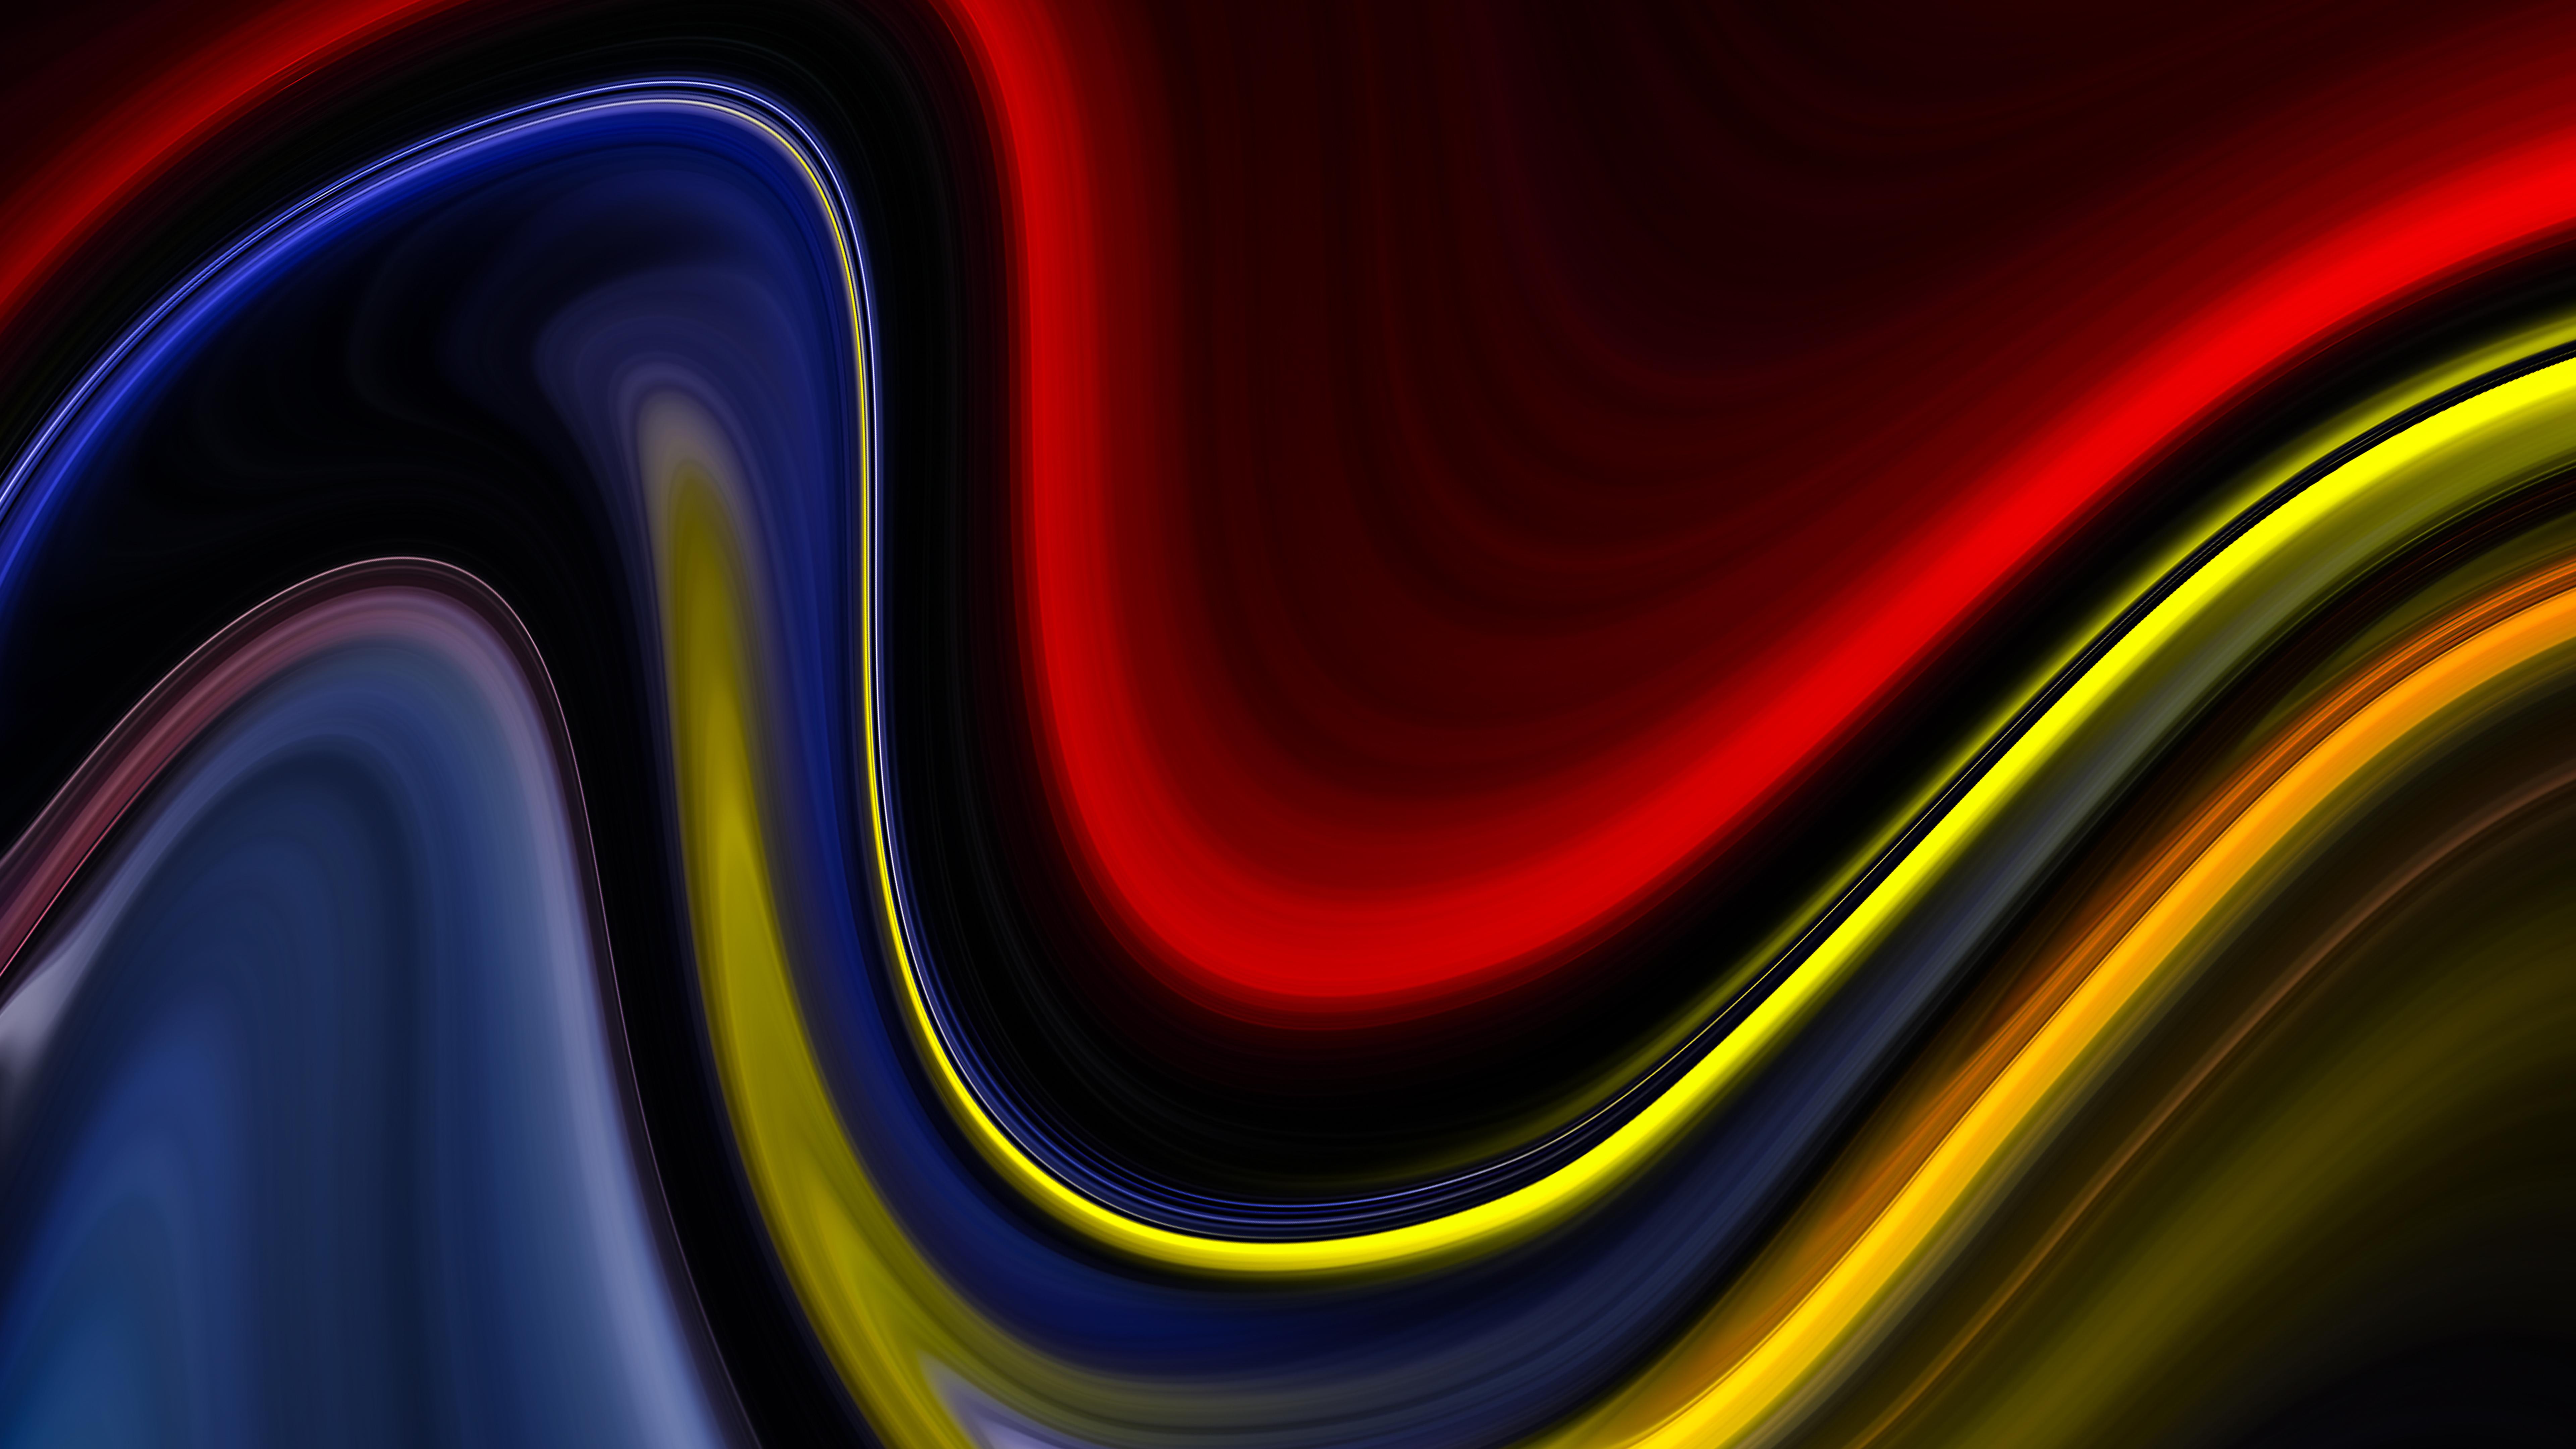 abstract lines neon 4k 1620164317 - Abstract Lines Neon 4k - Abstract Lines Neon 4k wallpapers